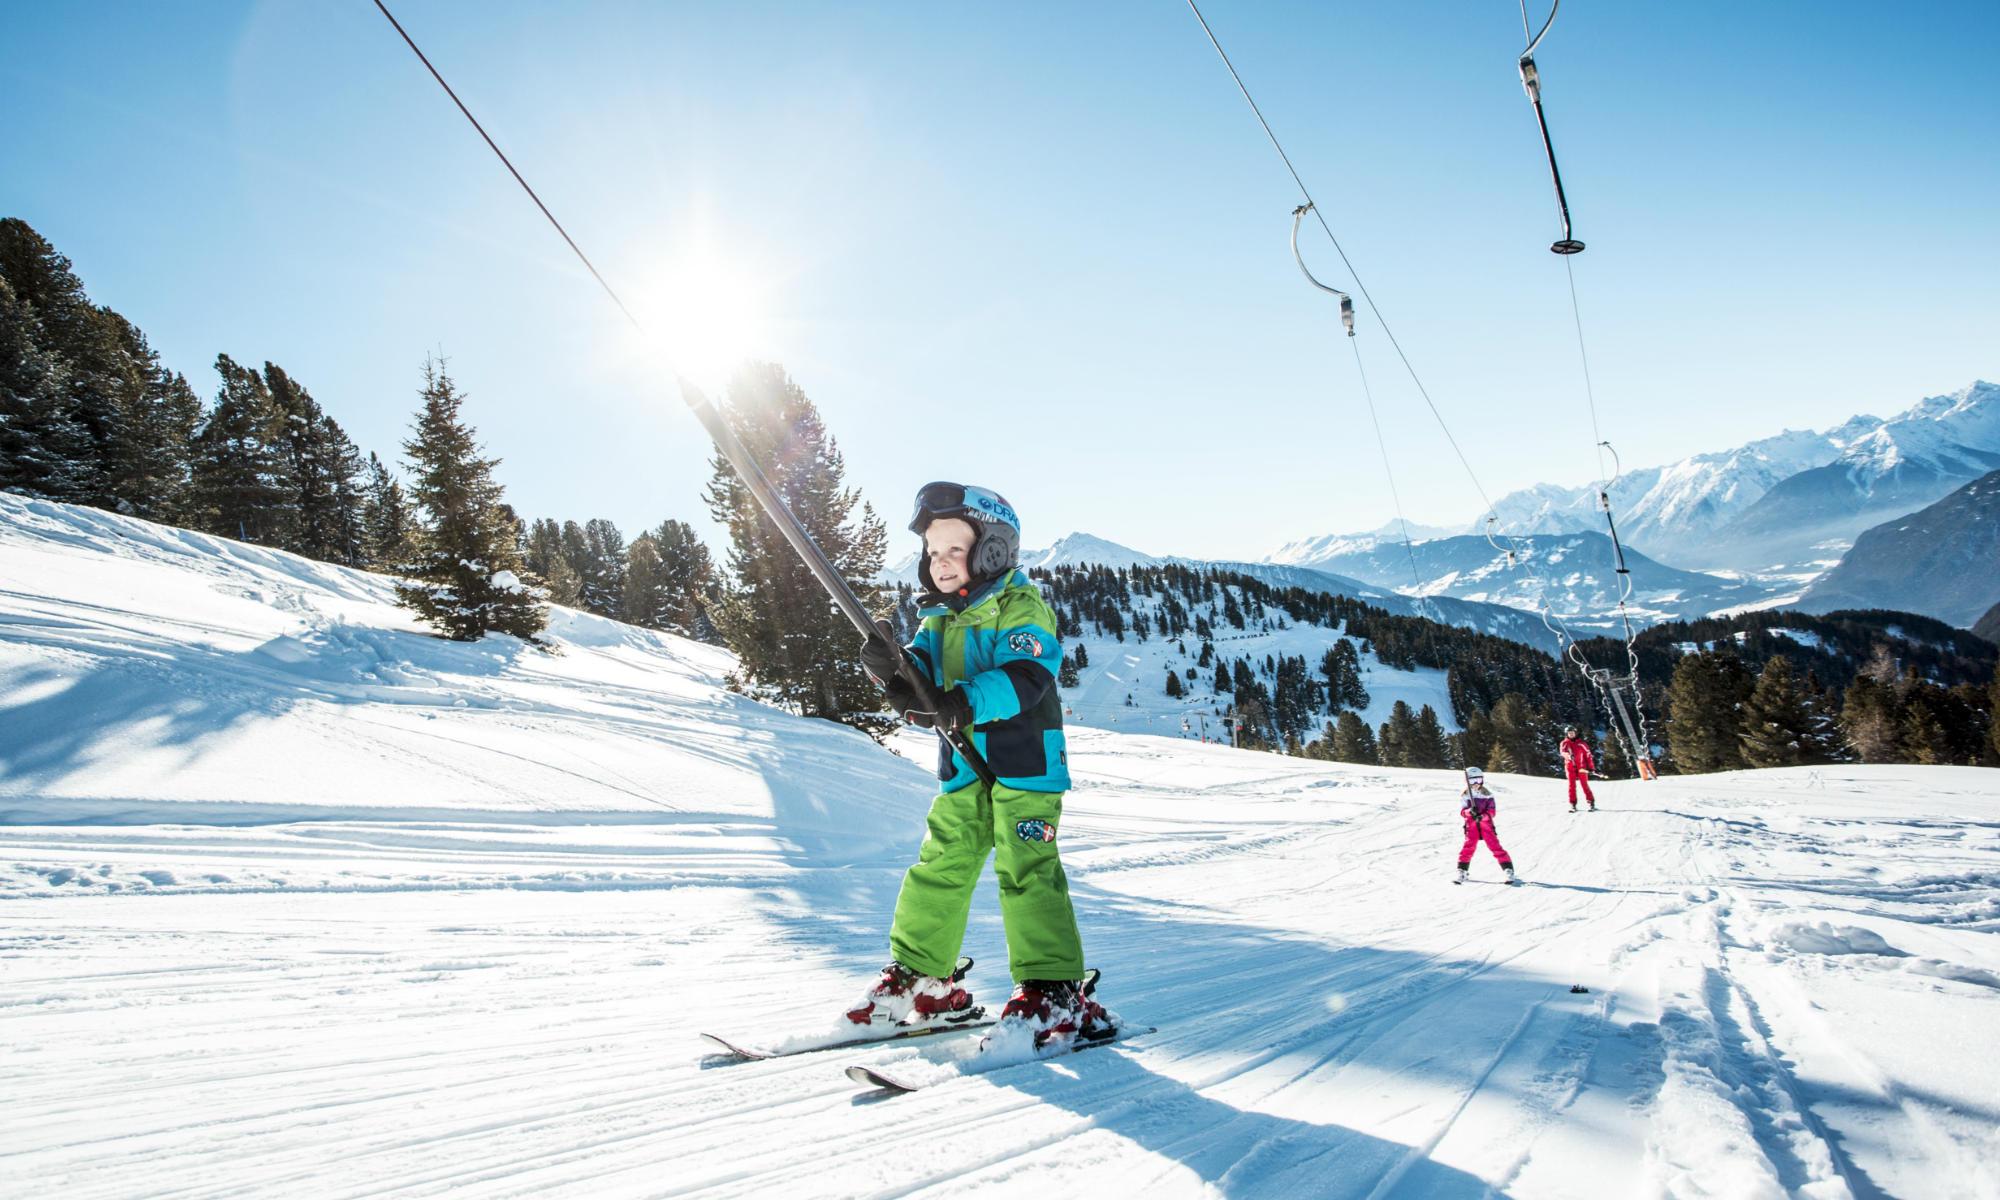 Boy taking the drag lift to the mountain station of the ski resort Sölden.